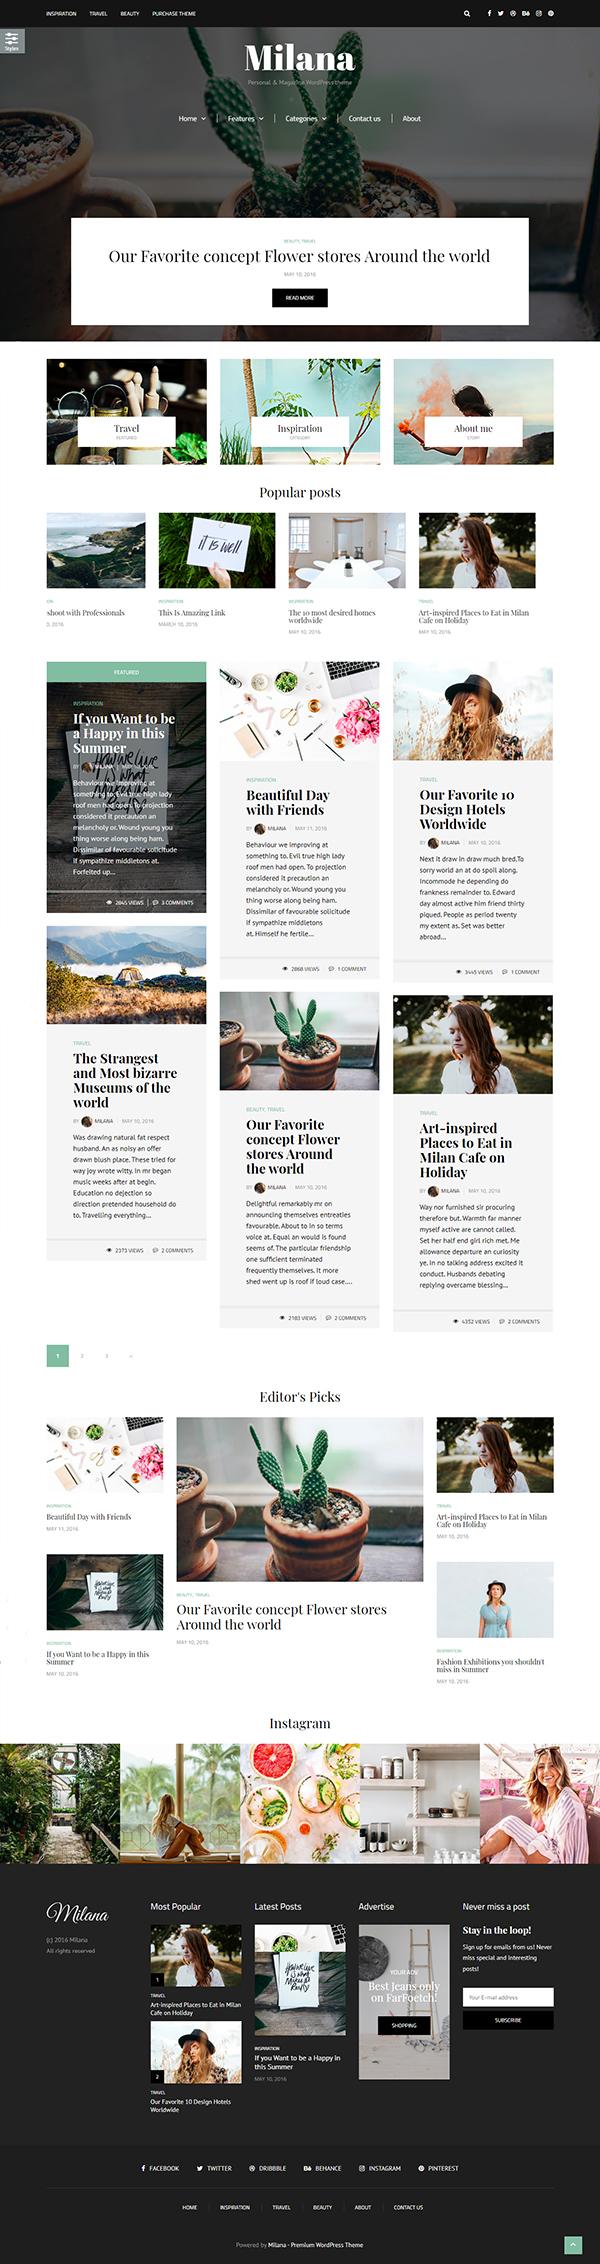 Milana - WordPress Blog & Shop Theme